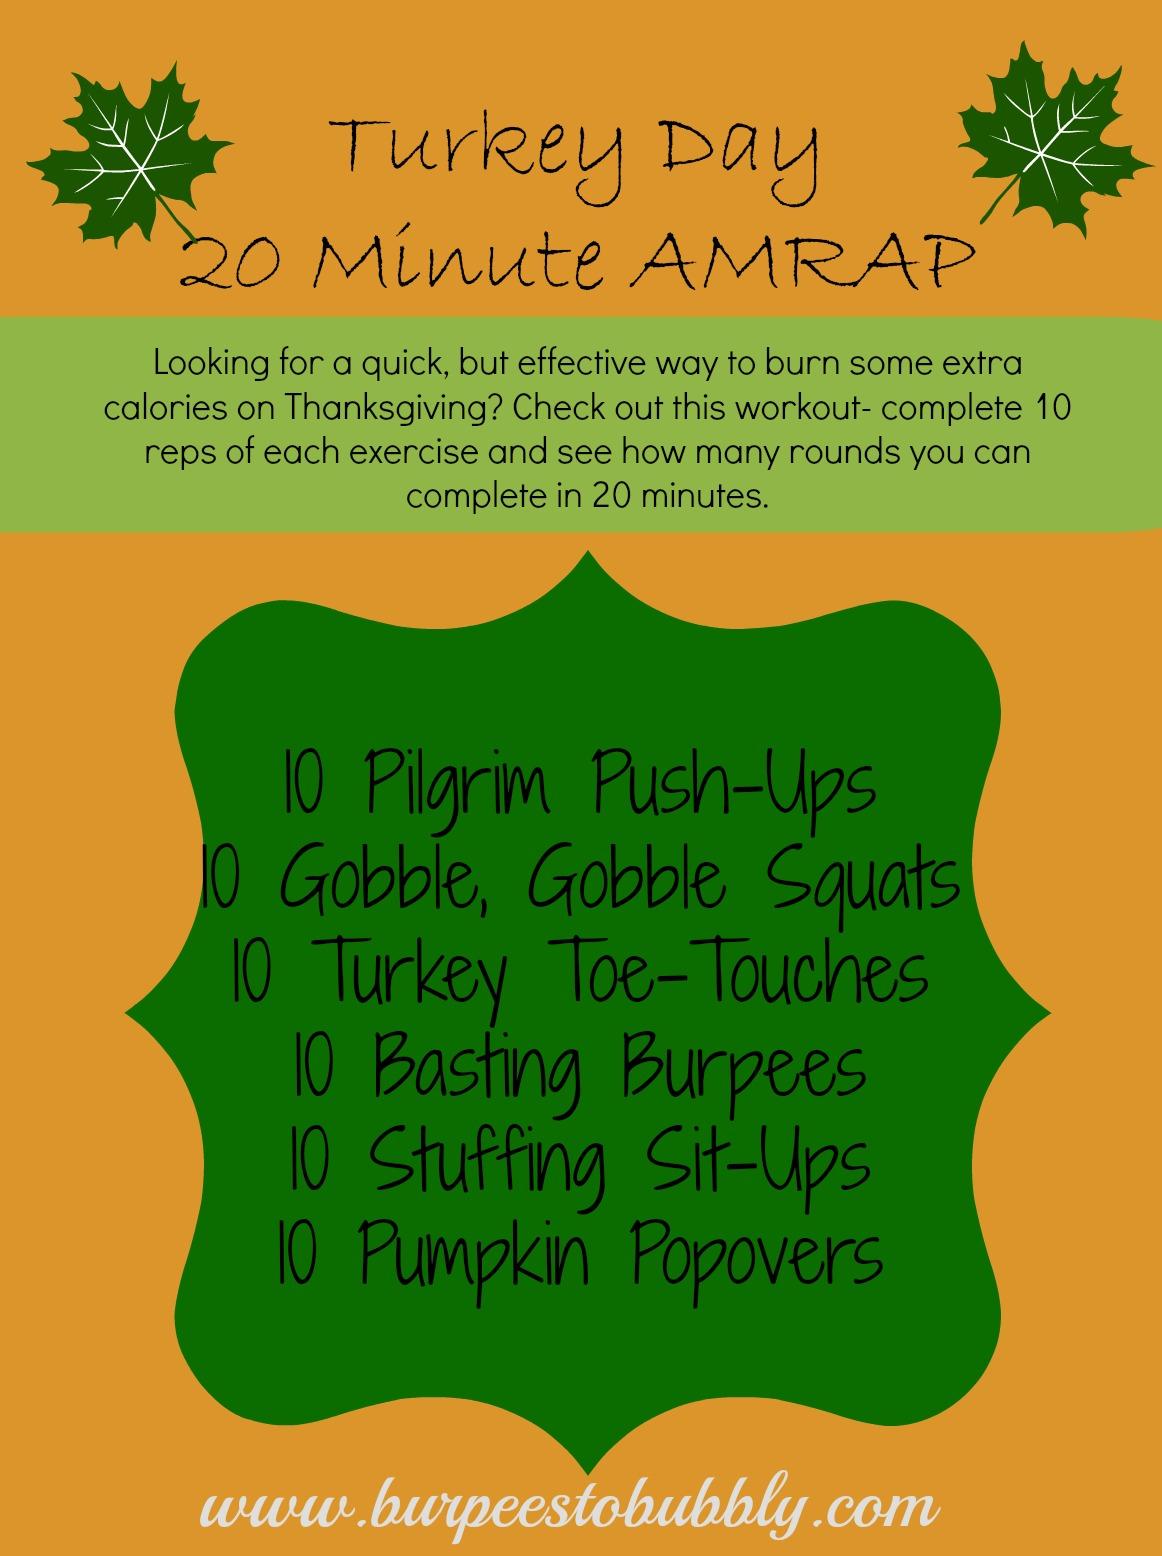 Turkey Day Hercules Style: Wednesday Workout: Turkey- Day 20 Minute AMRAP Workout